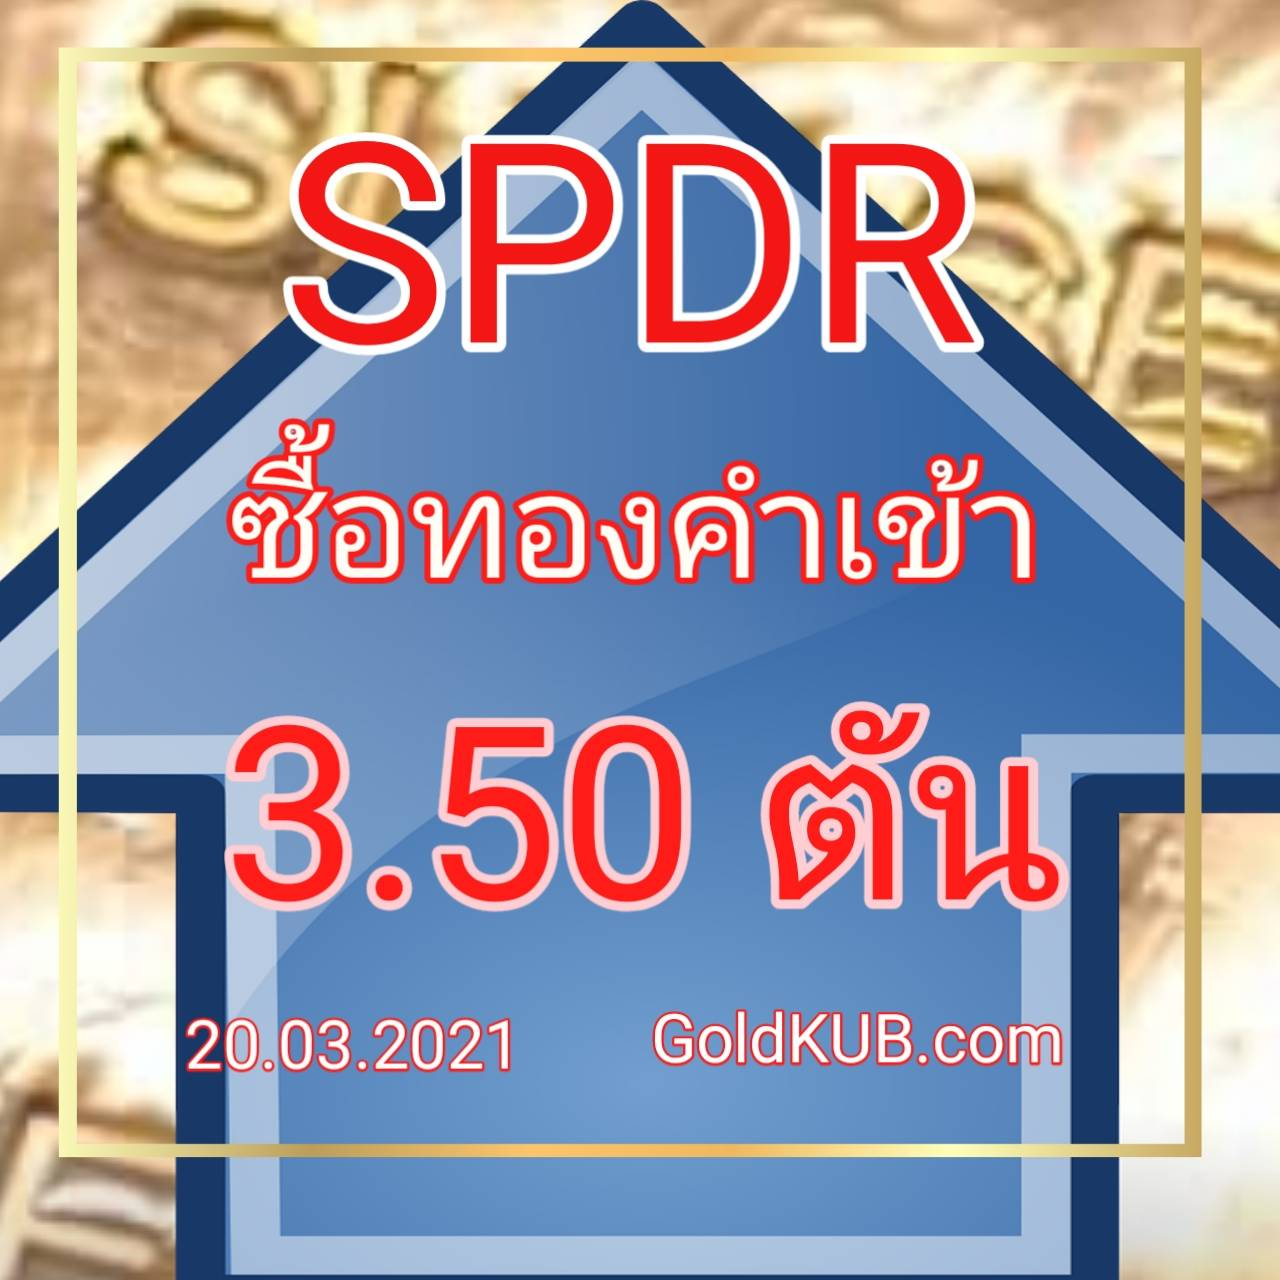 spdr 20.03 goldkub